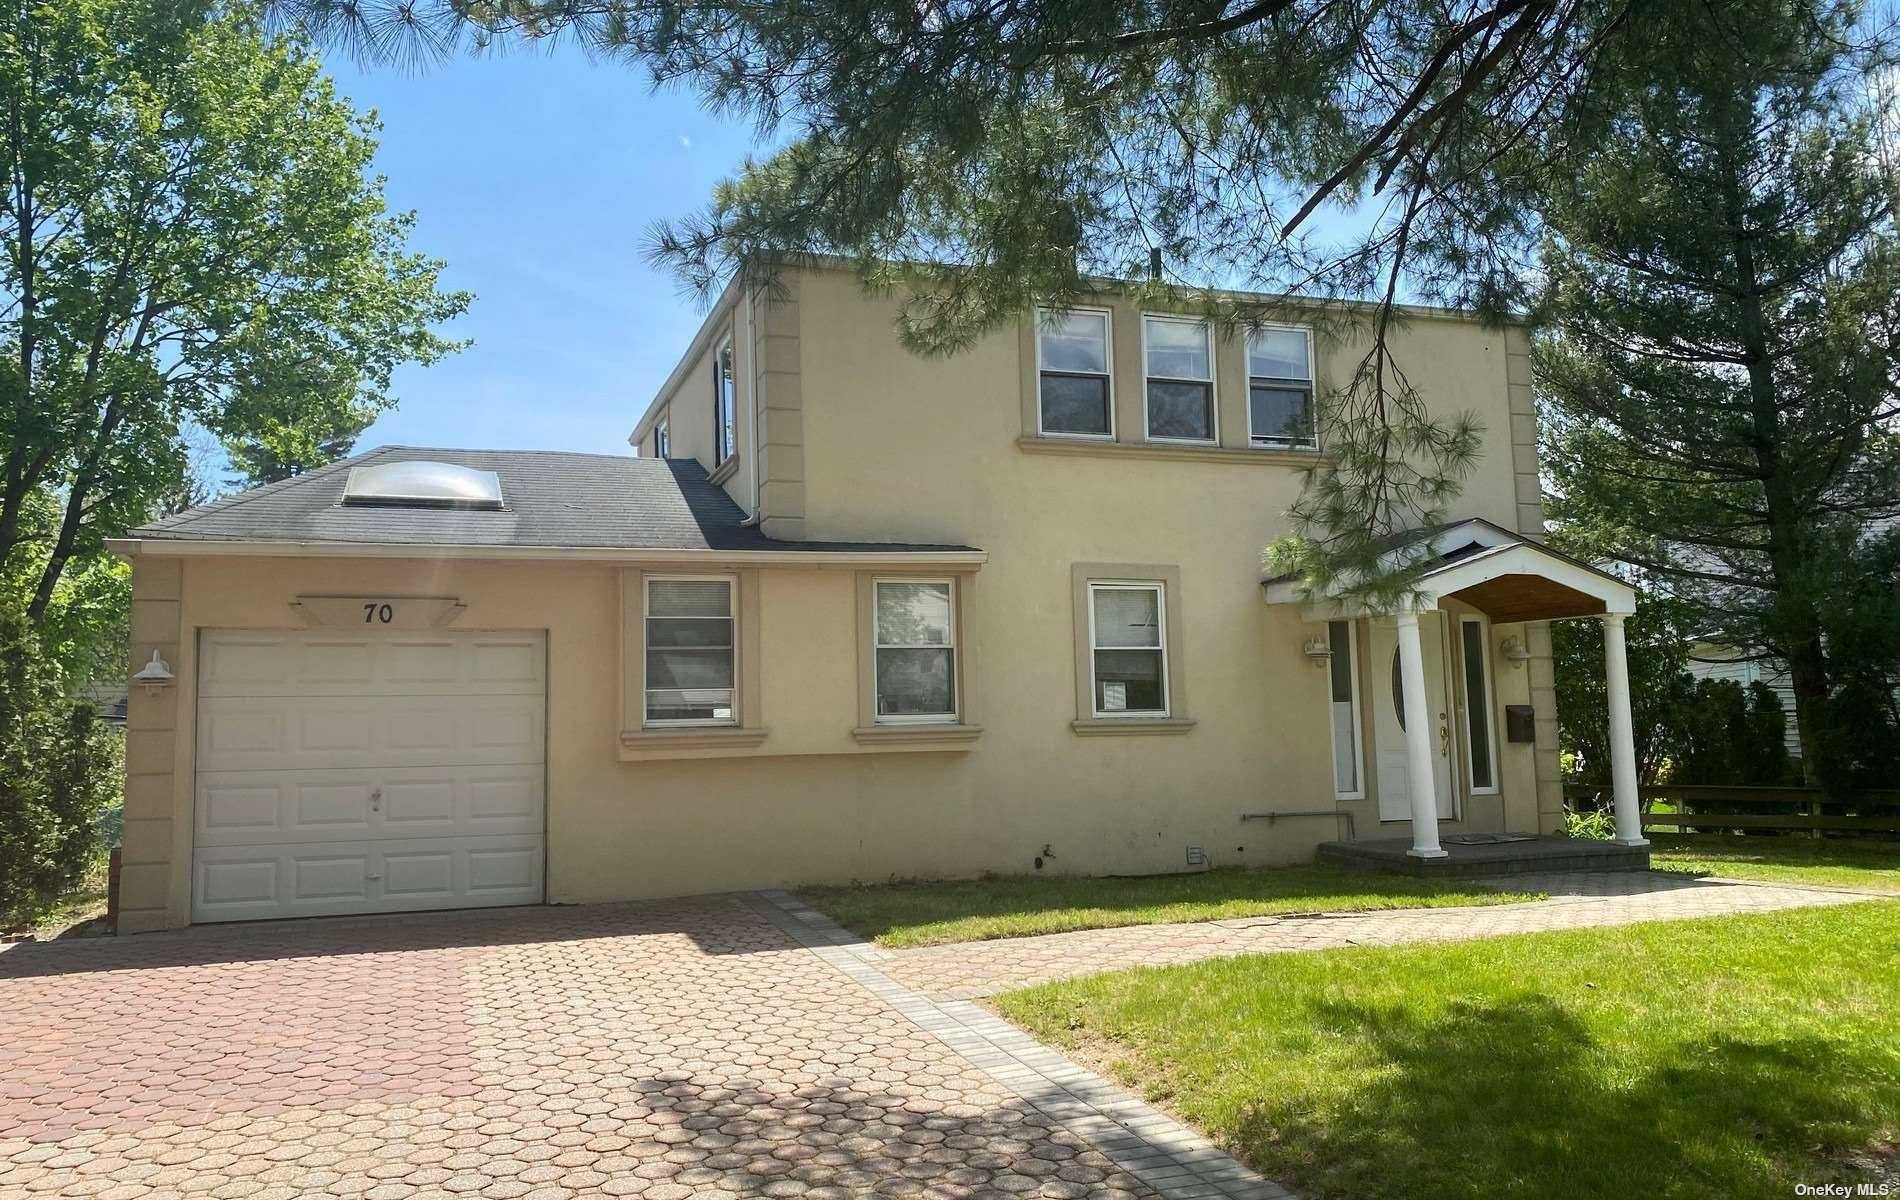 70 Peachtree Lane, Roslyn Heights, NY 11577 - MLS#: 3311454